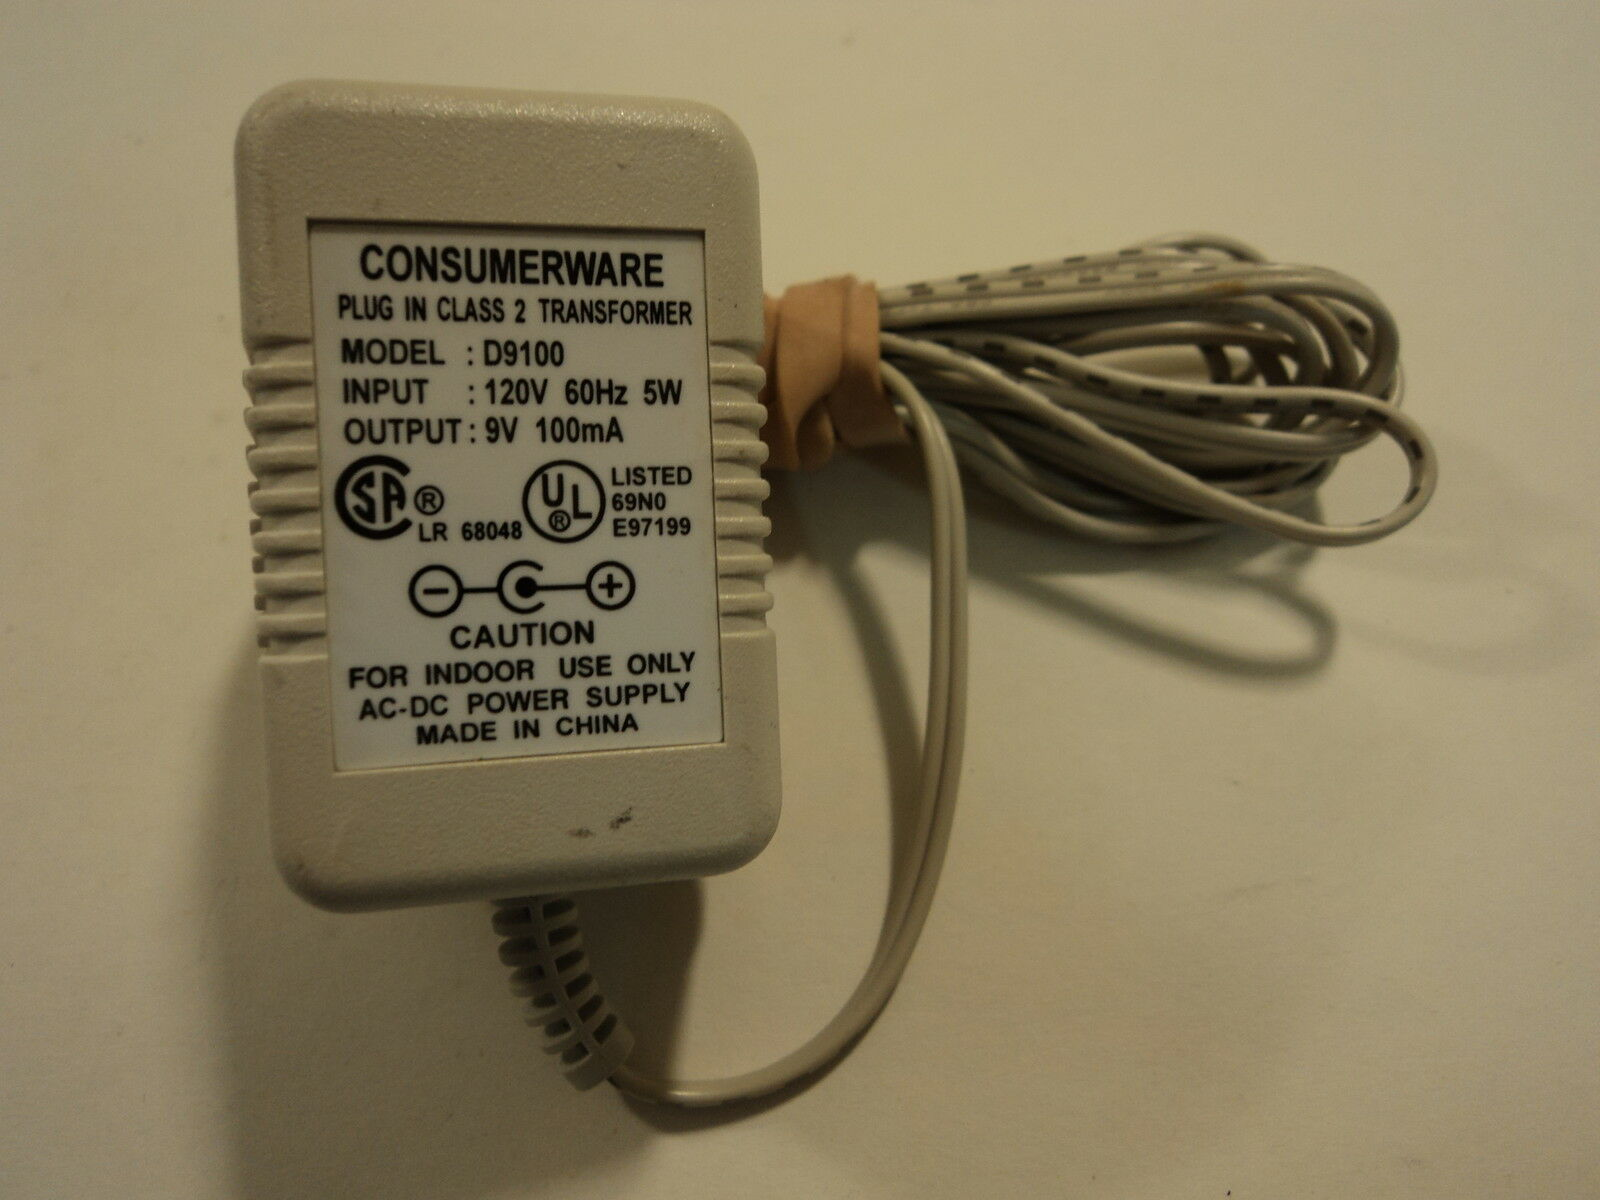 Consumerware Power Adaptor Plug In Class 2 Transformer 9VDC 100mA D9100